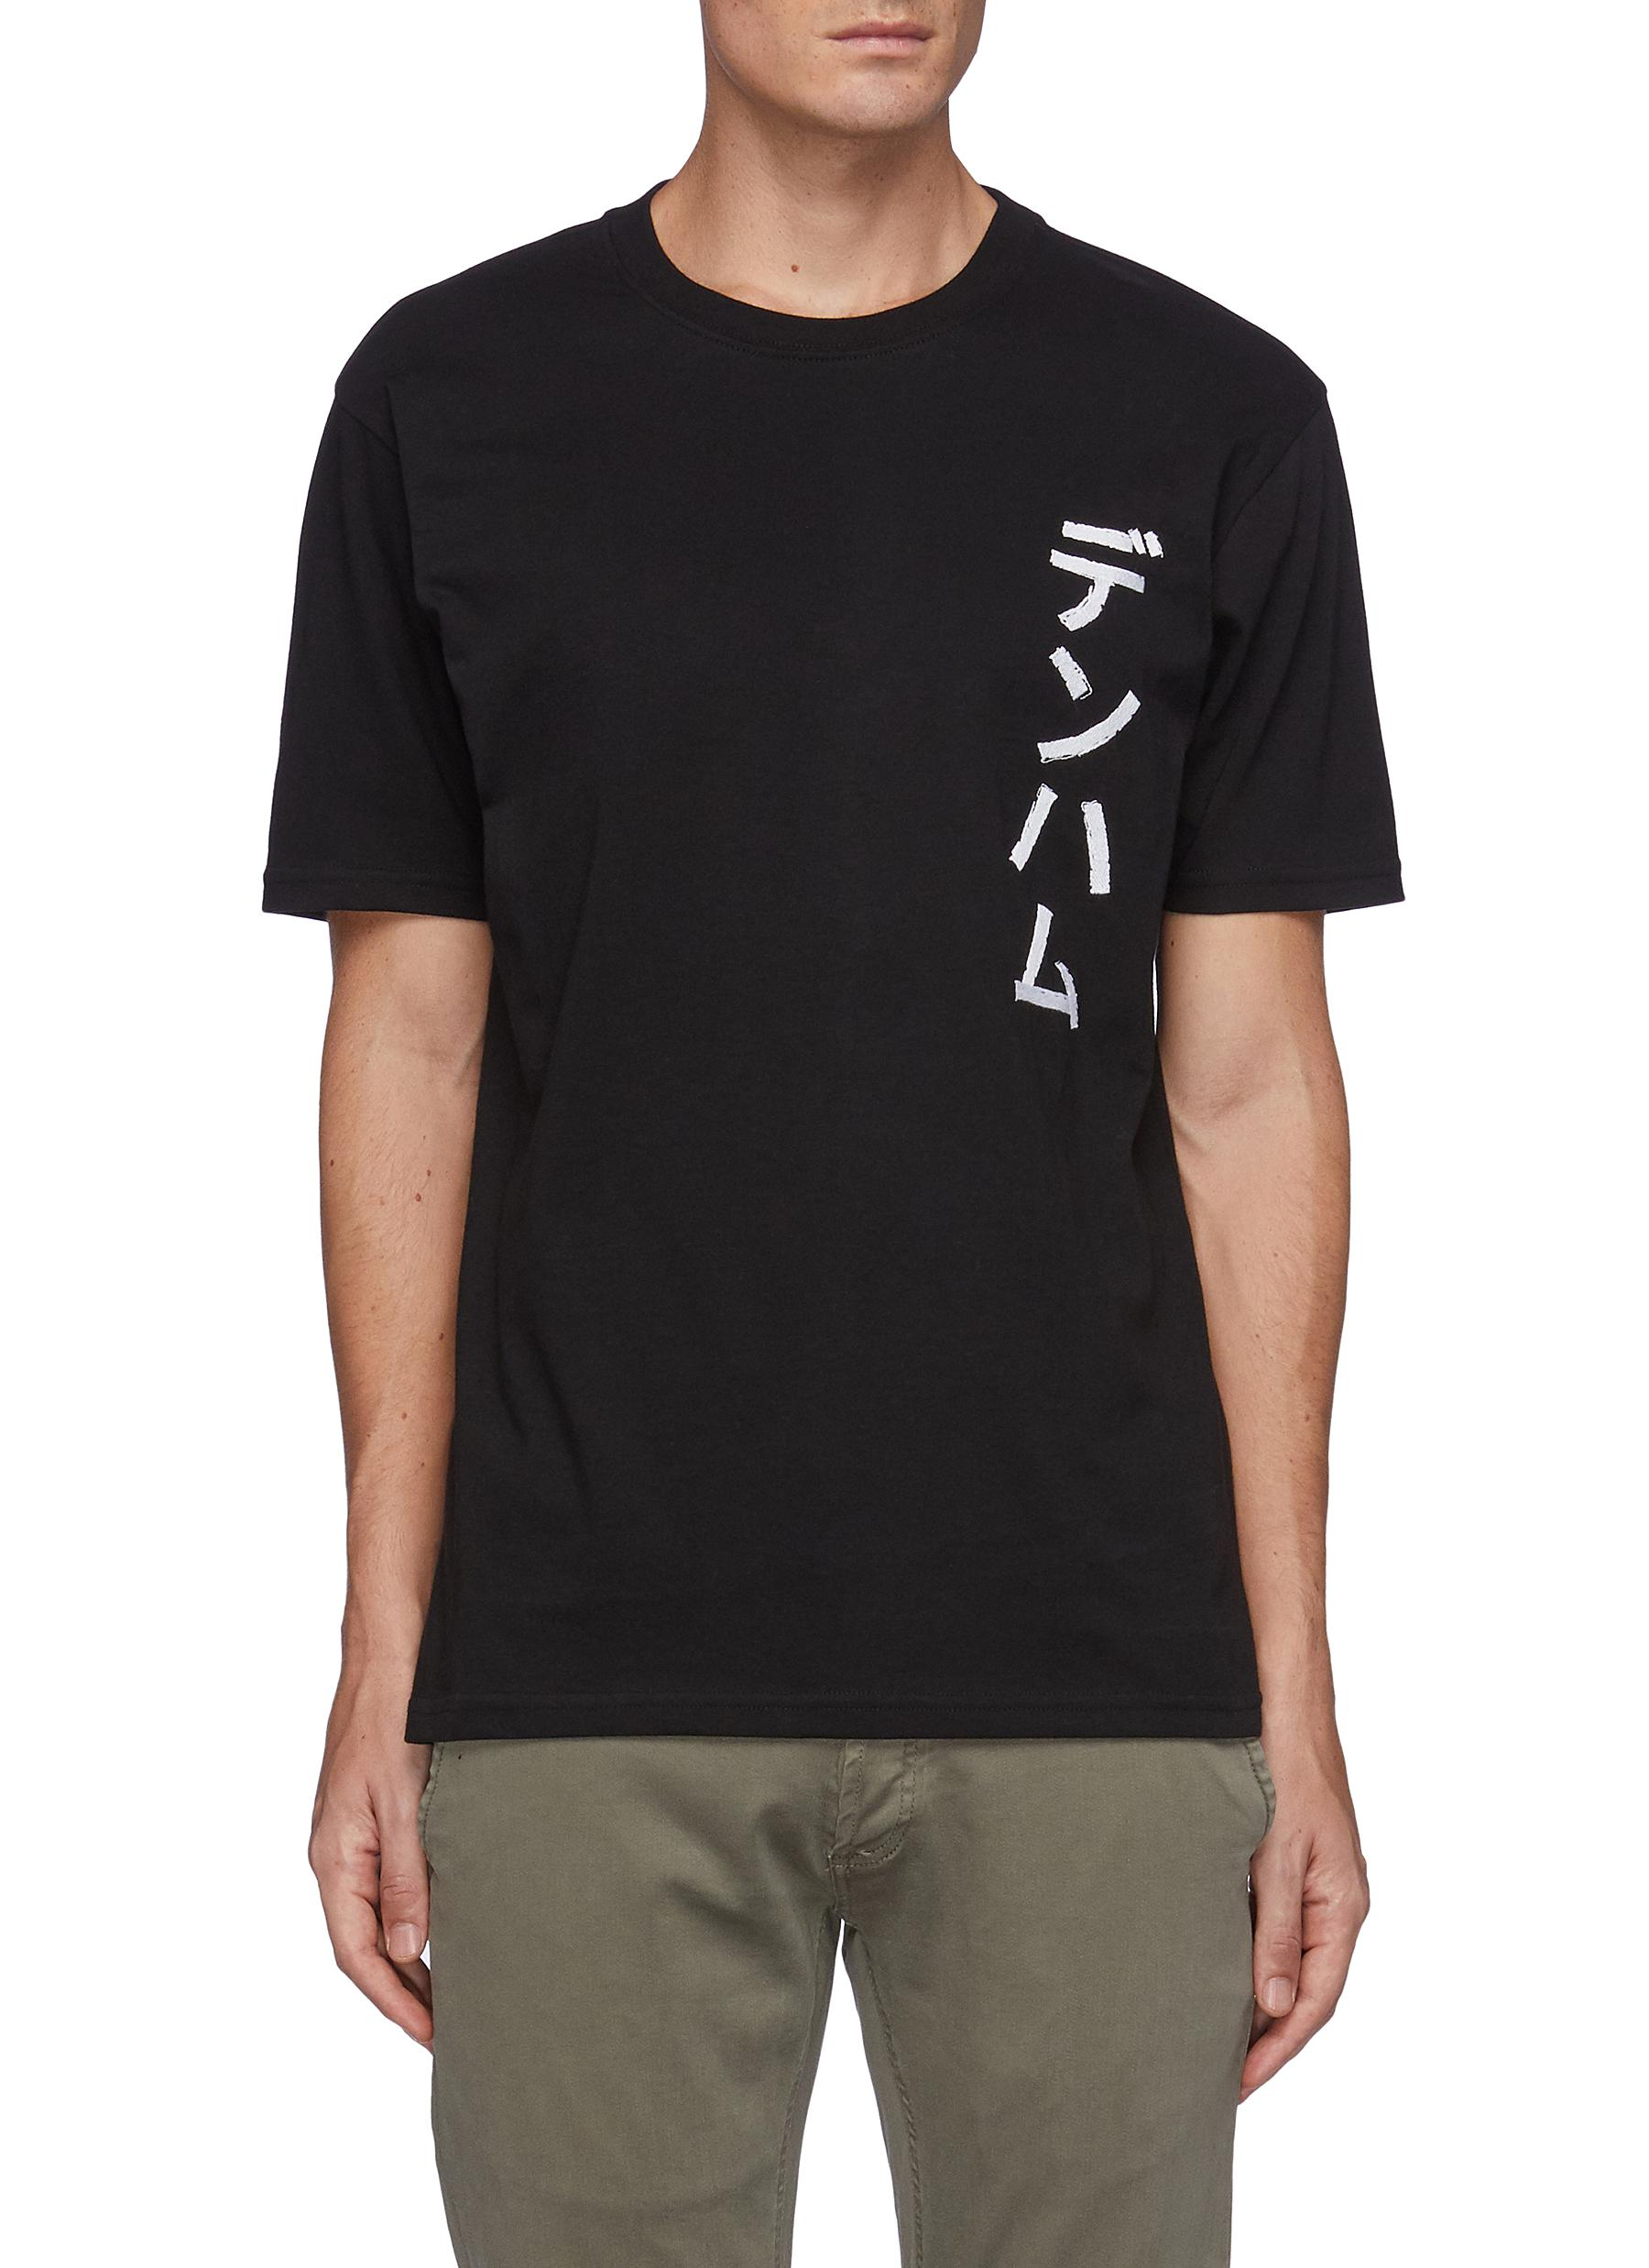 Japanese Font Branded Cotton Crewneck T-Shirt